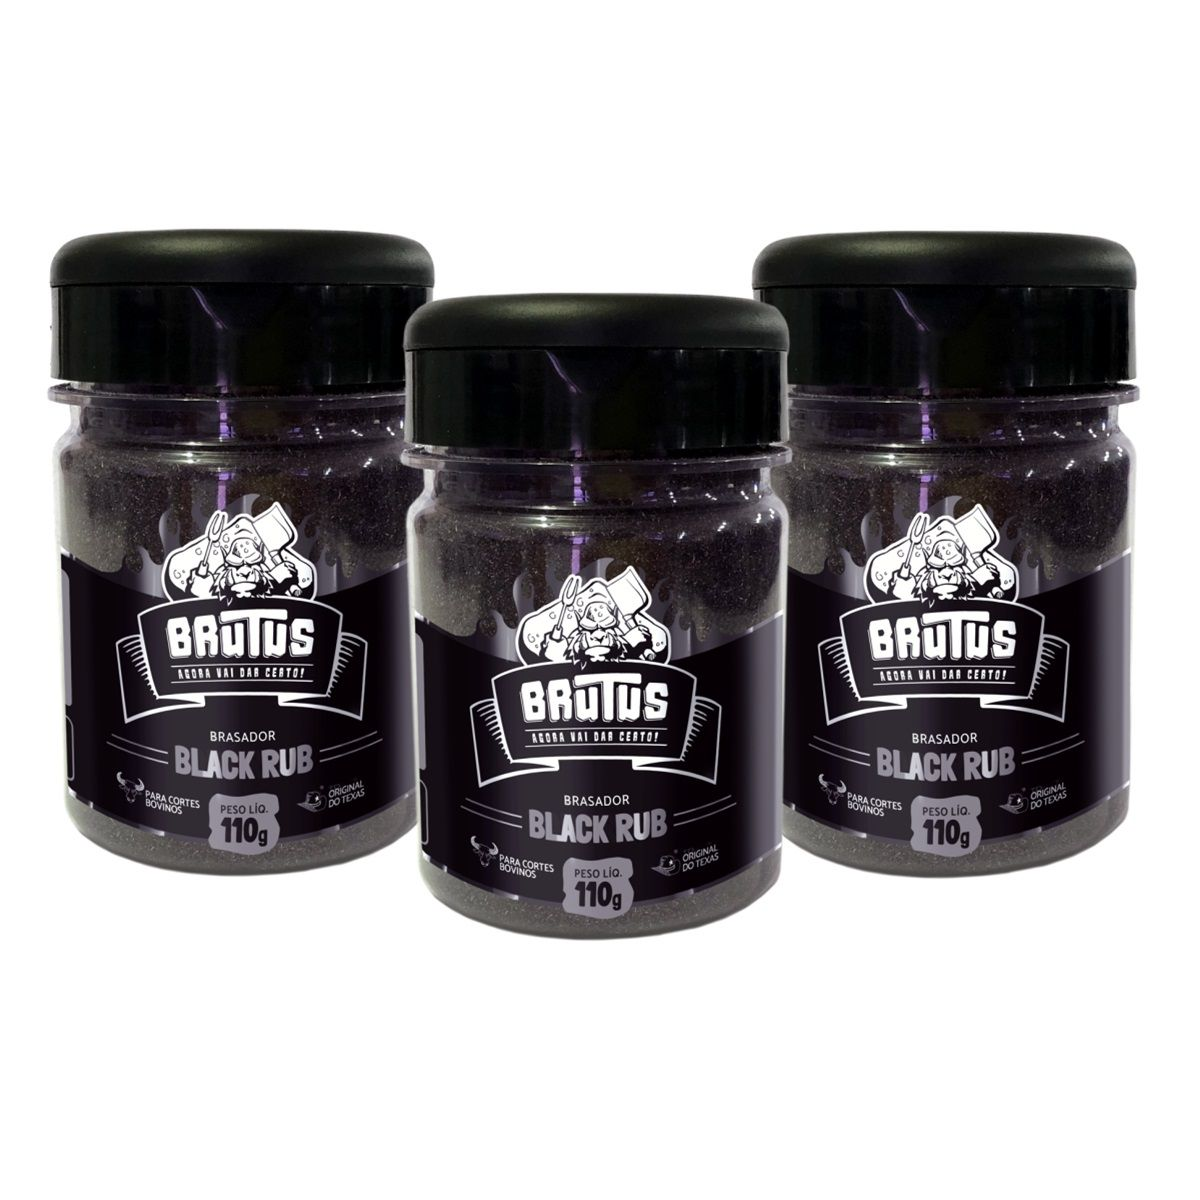 Black Rub Tempero para Bovinos Brutus 110g 03 unidades